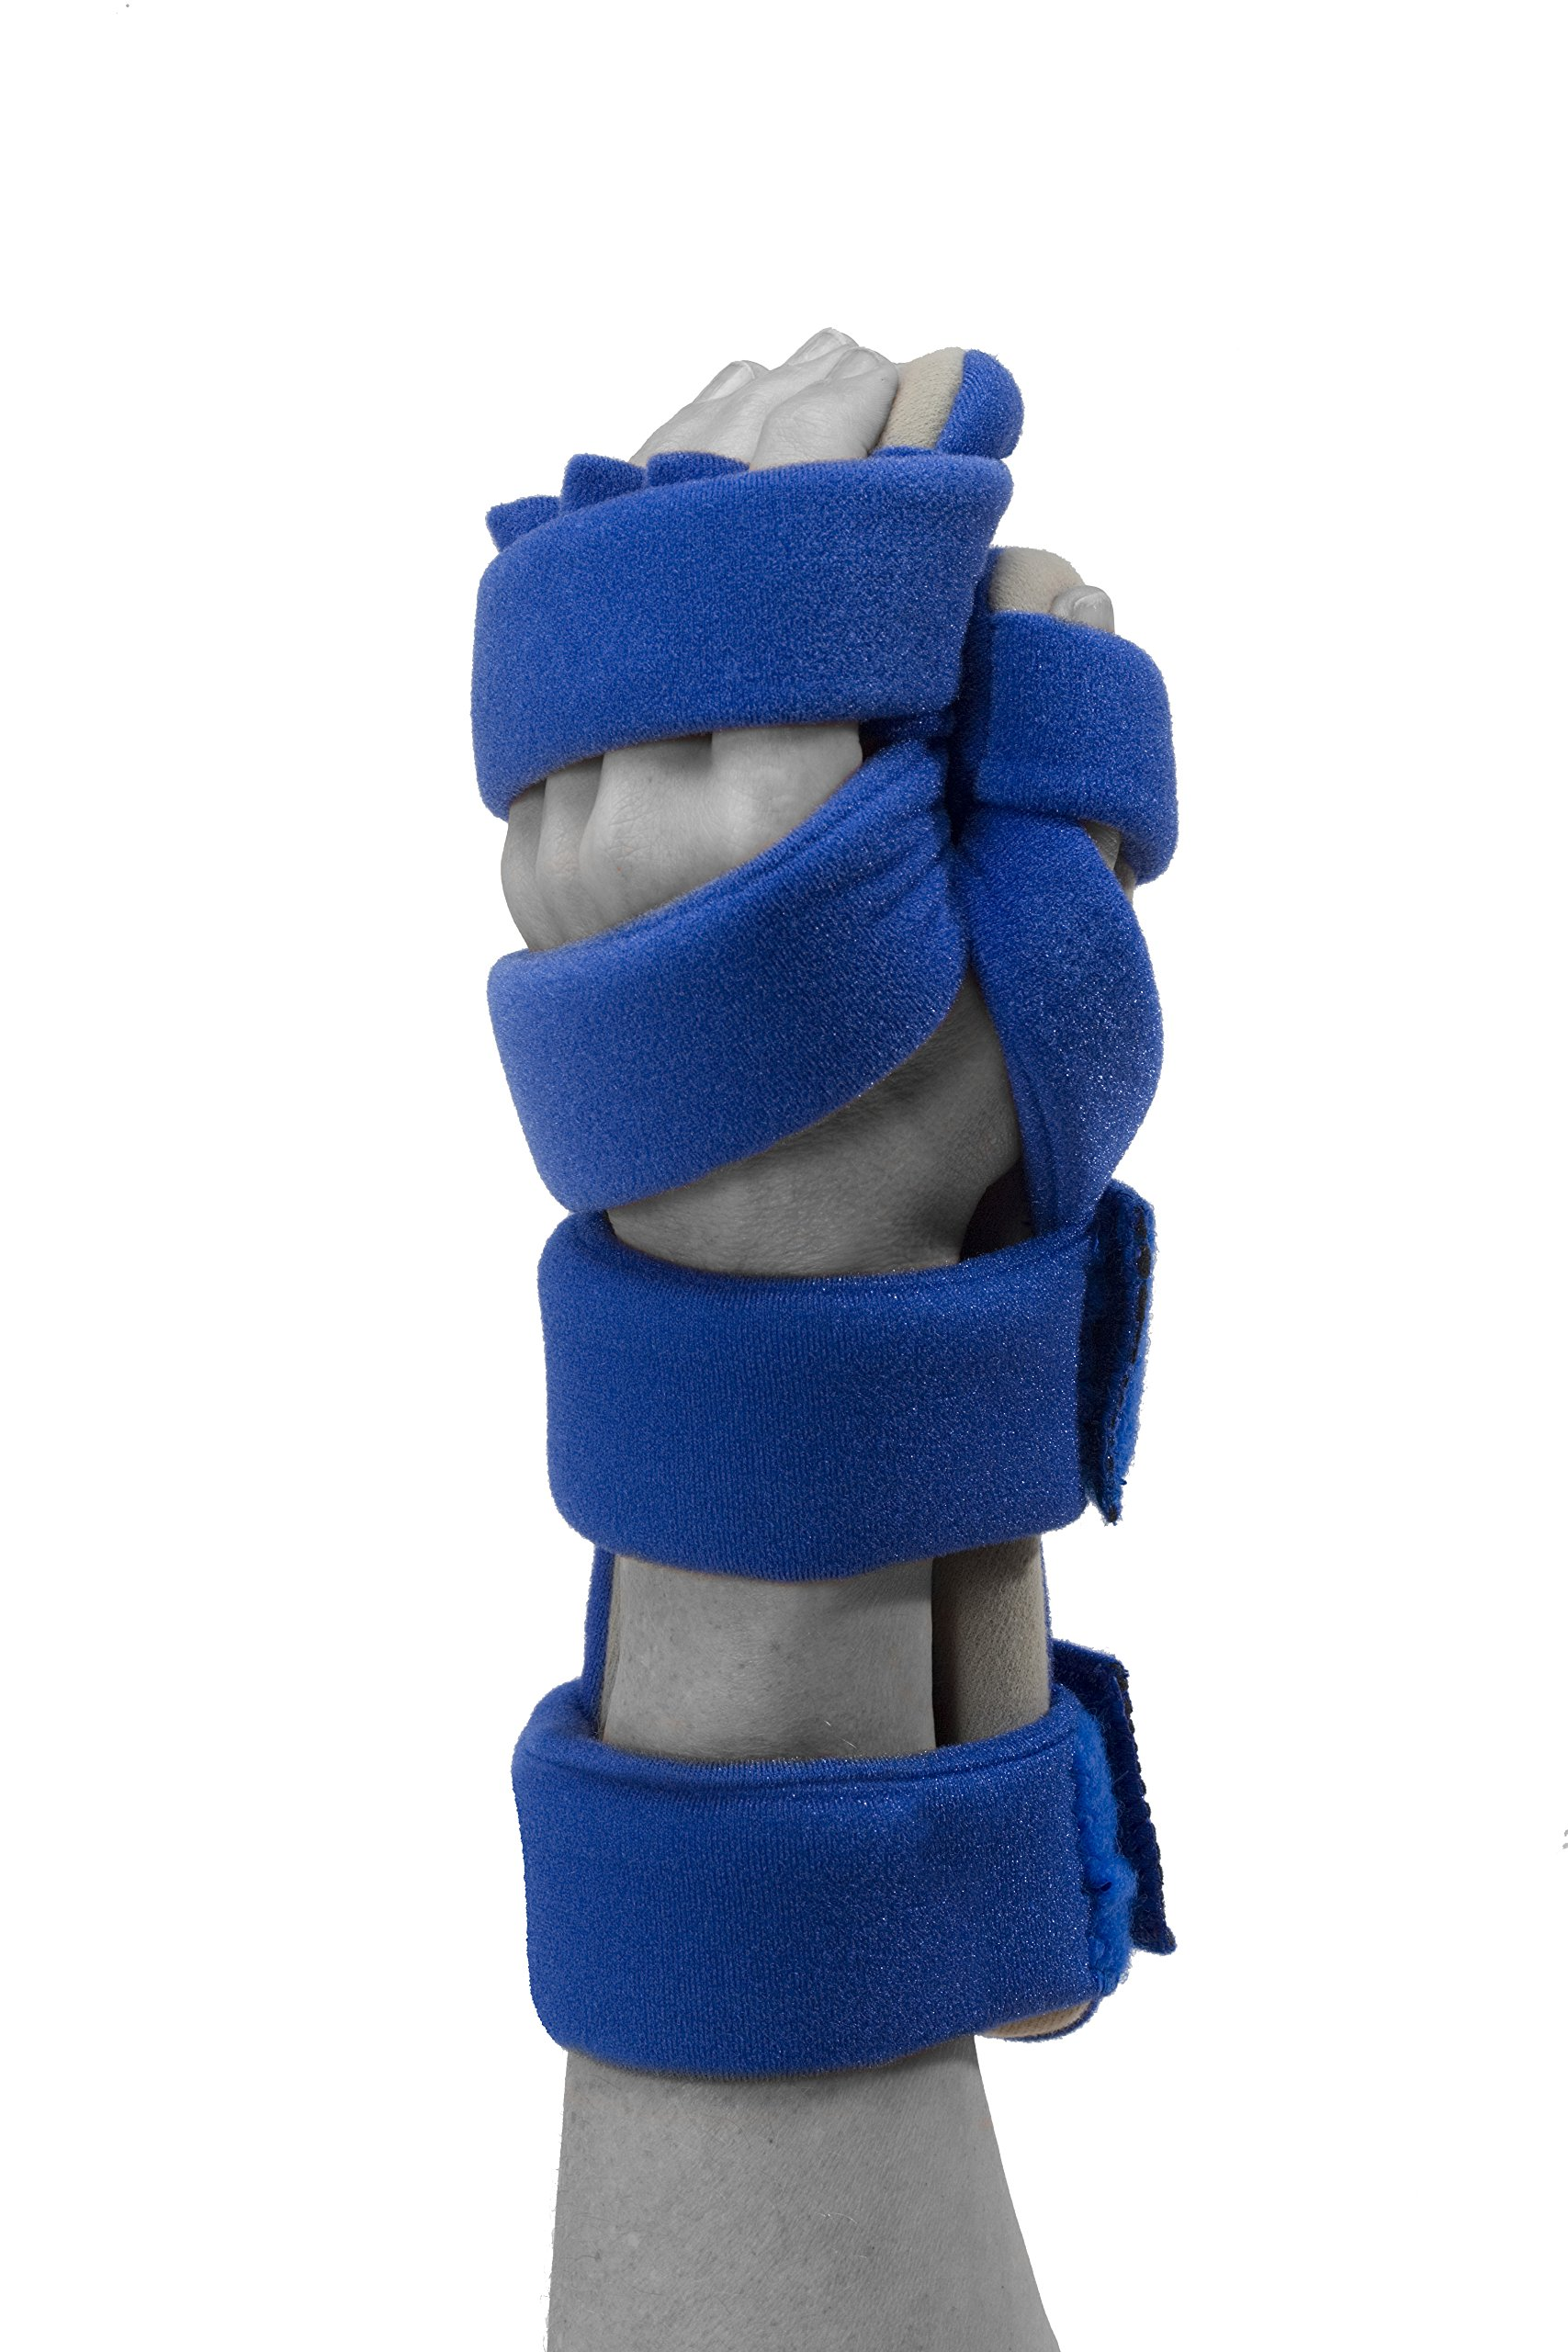 Restorative Medical Hand Brace | Resting Hand & Wrist Night Splint w/Flo-Form - Corrective, Supportive Brace for Comfort & Pain Relief